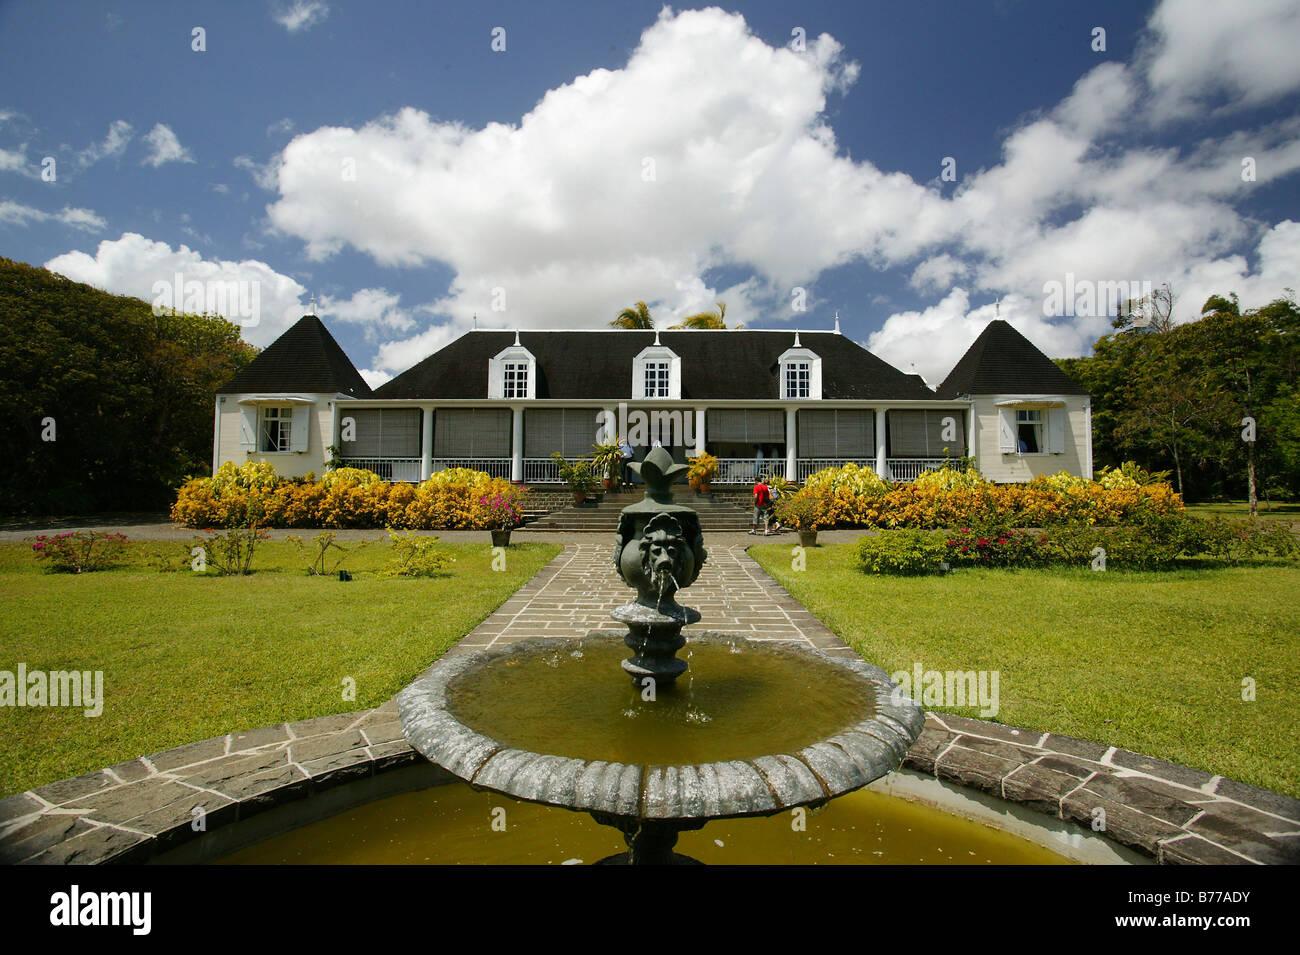 Le Kolonialstil le aubin colonial style house built in 1819 mauritius